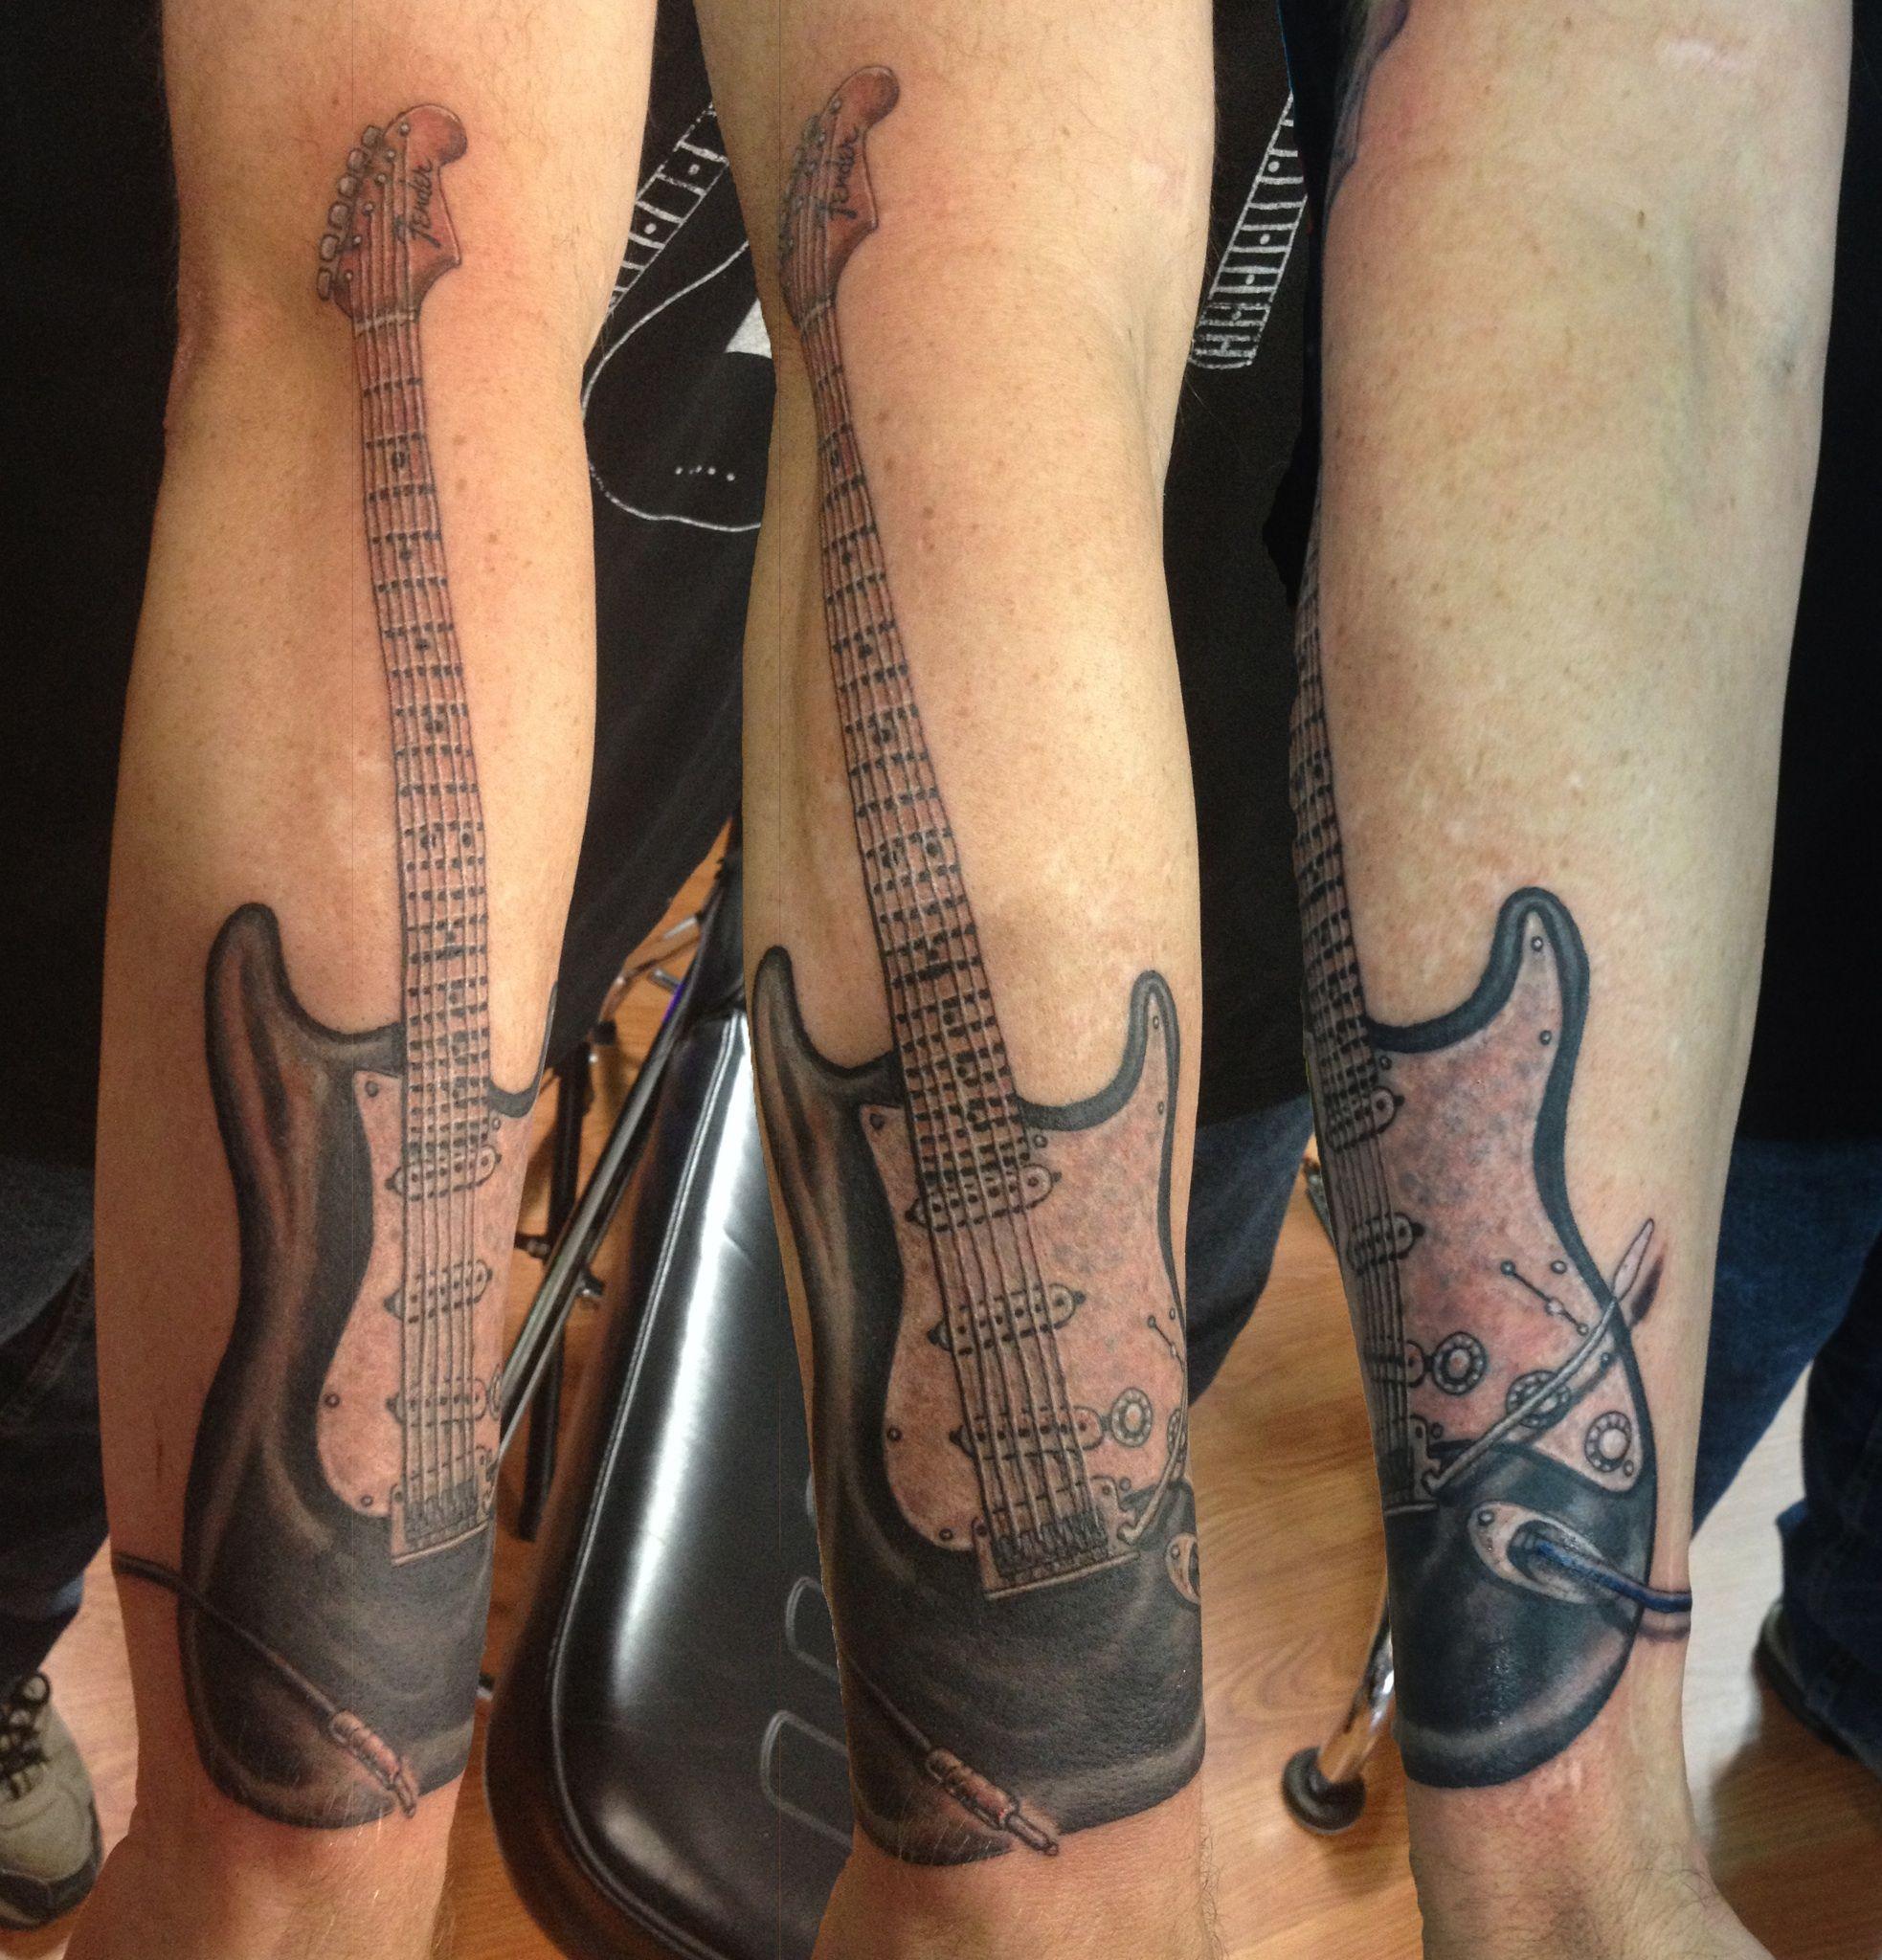 Fender guitar tattoo